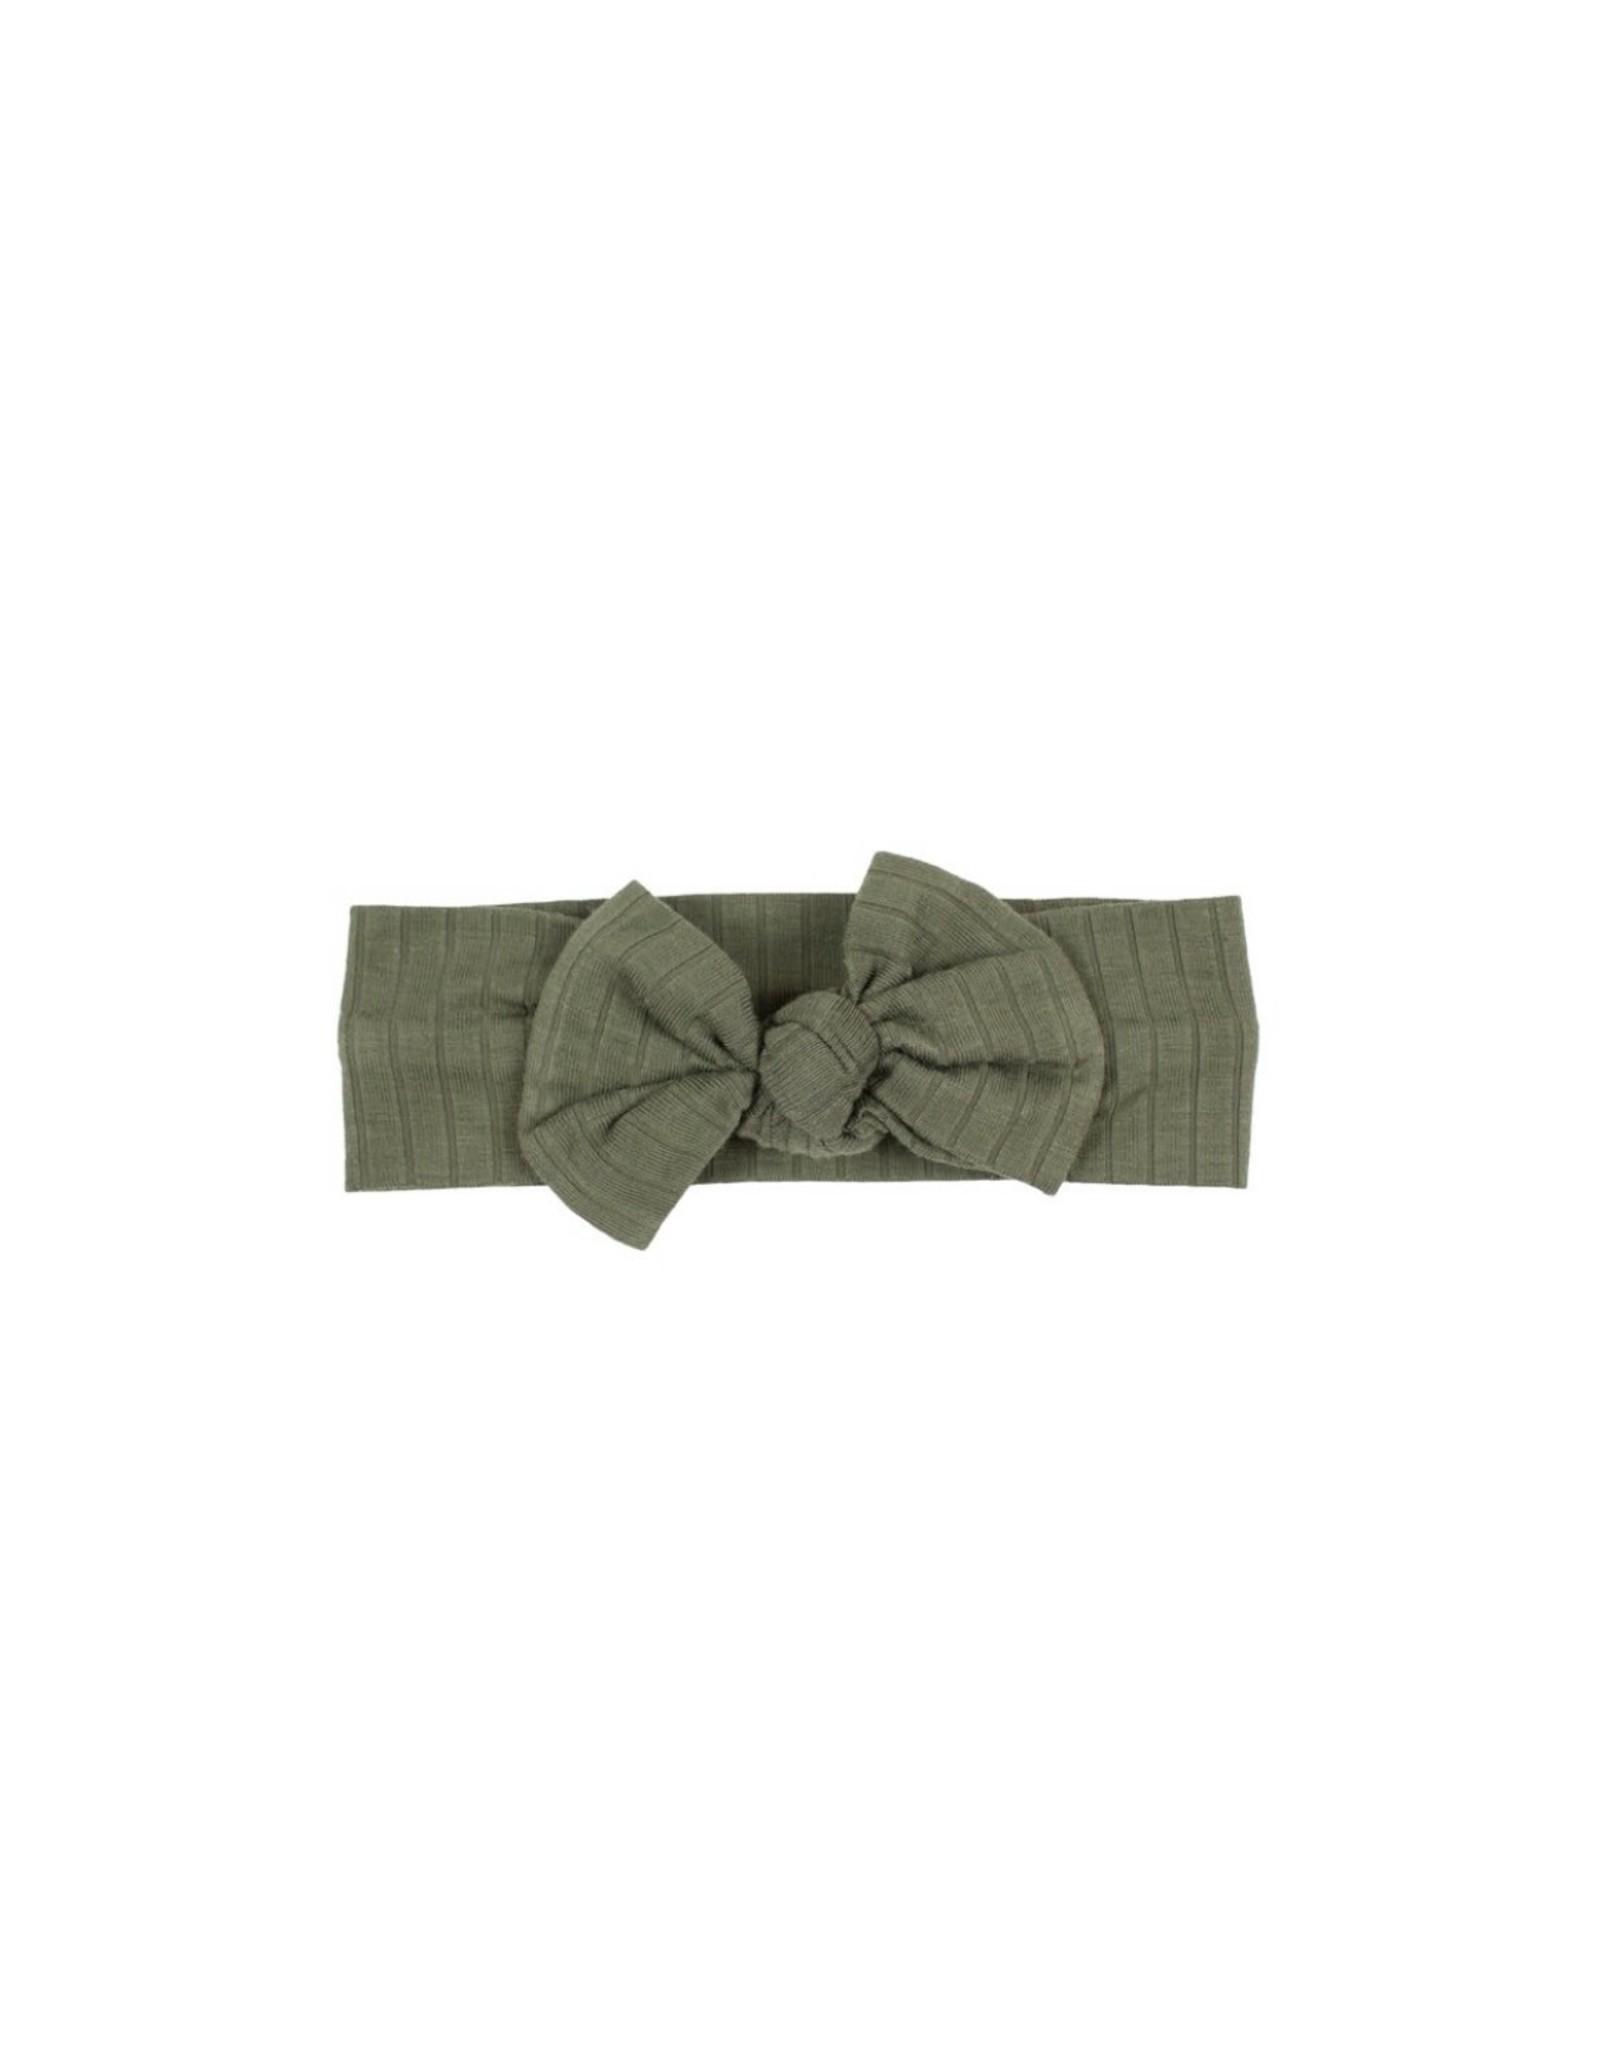 Brave Little Ones Brave Little Ones- Dark Olive Bow Headband